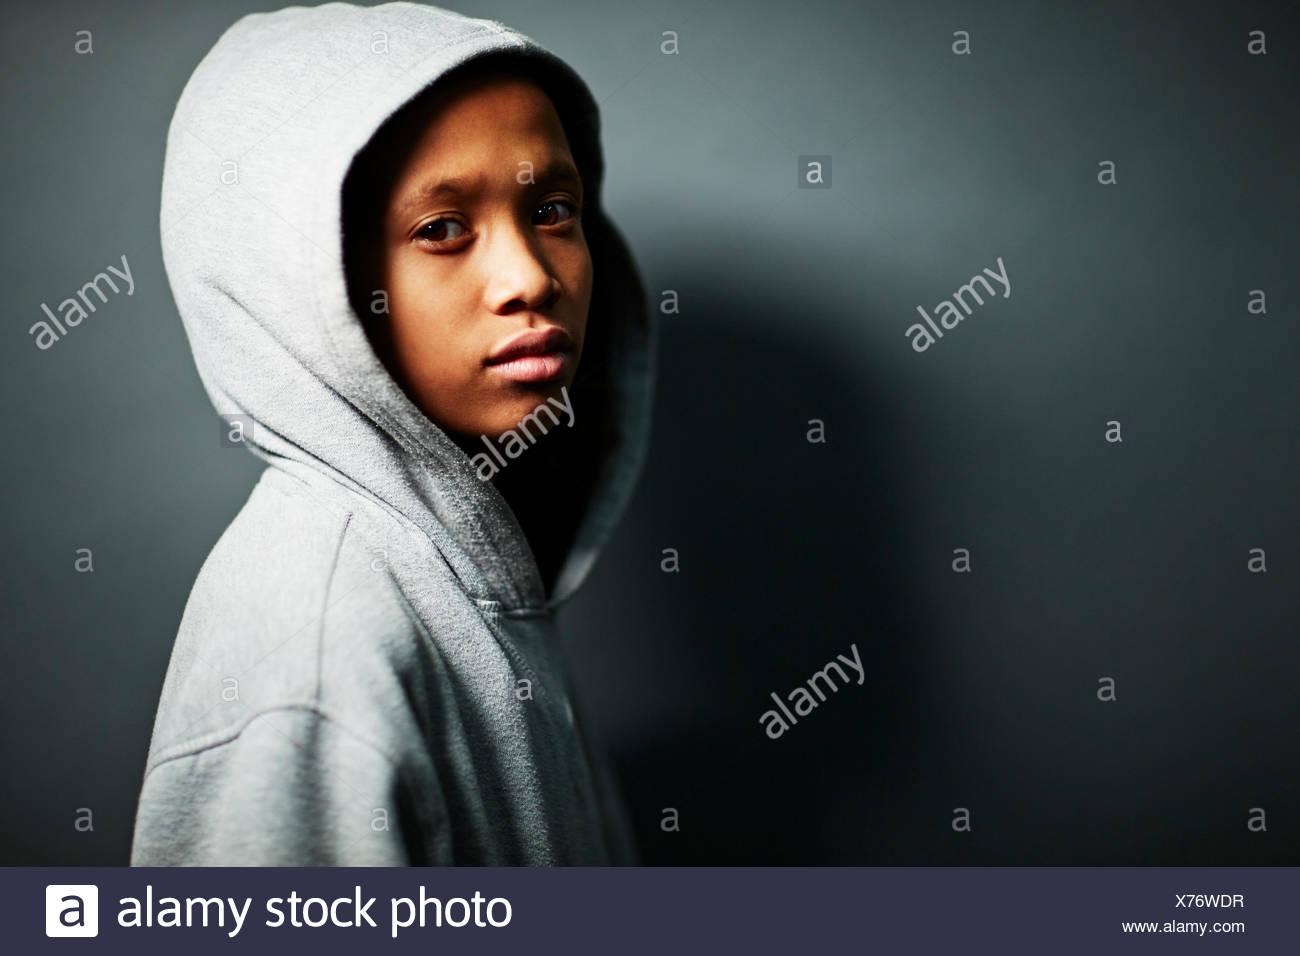 Boy wearing grey hooded top - Stock Image